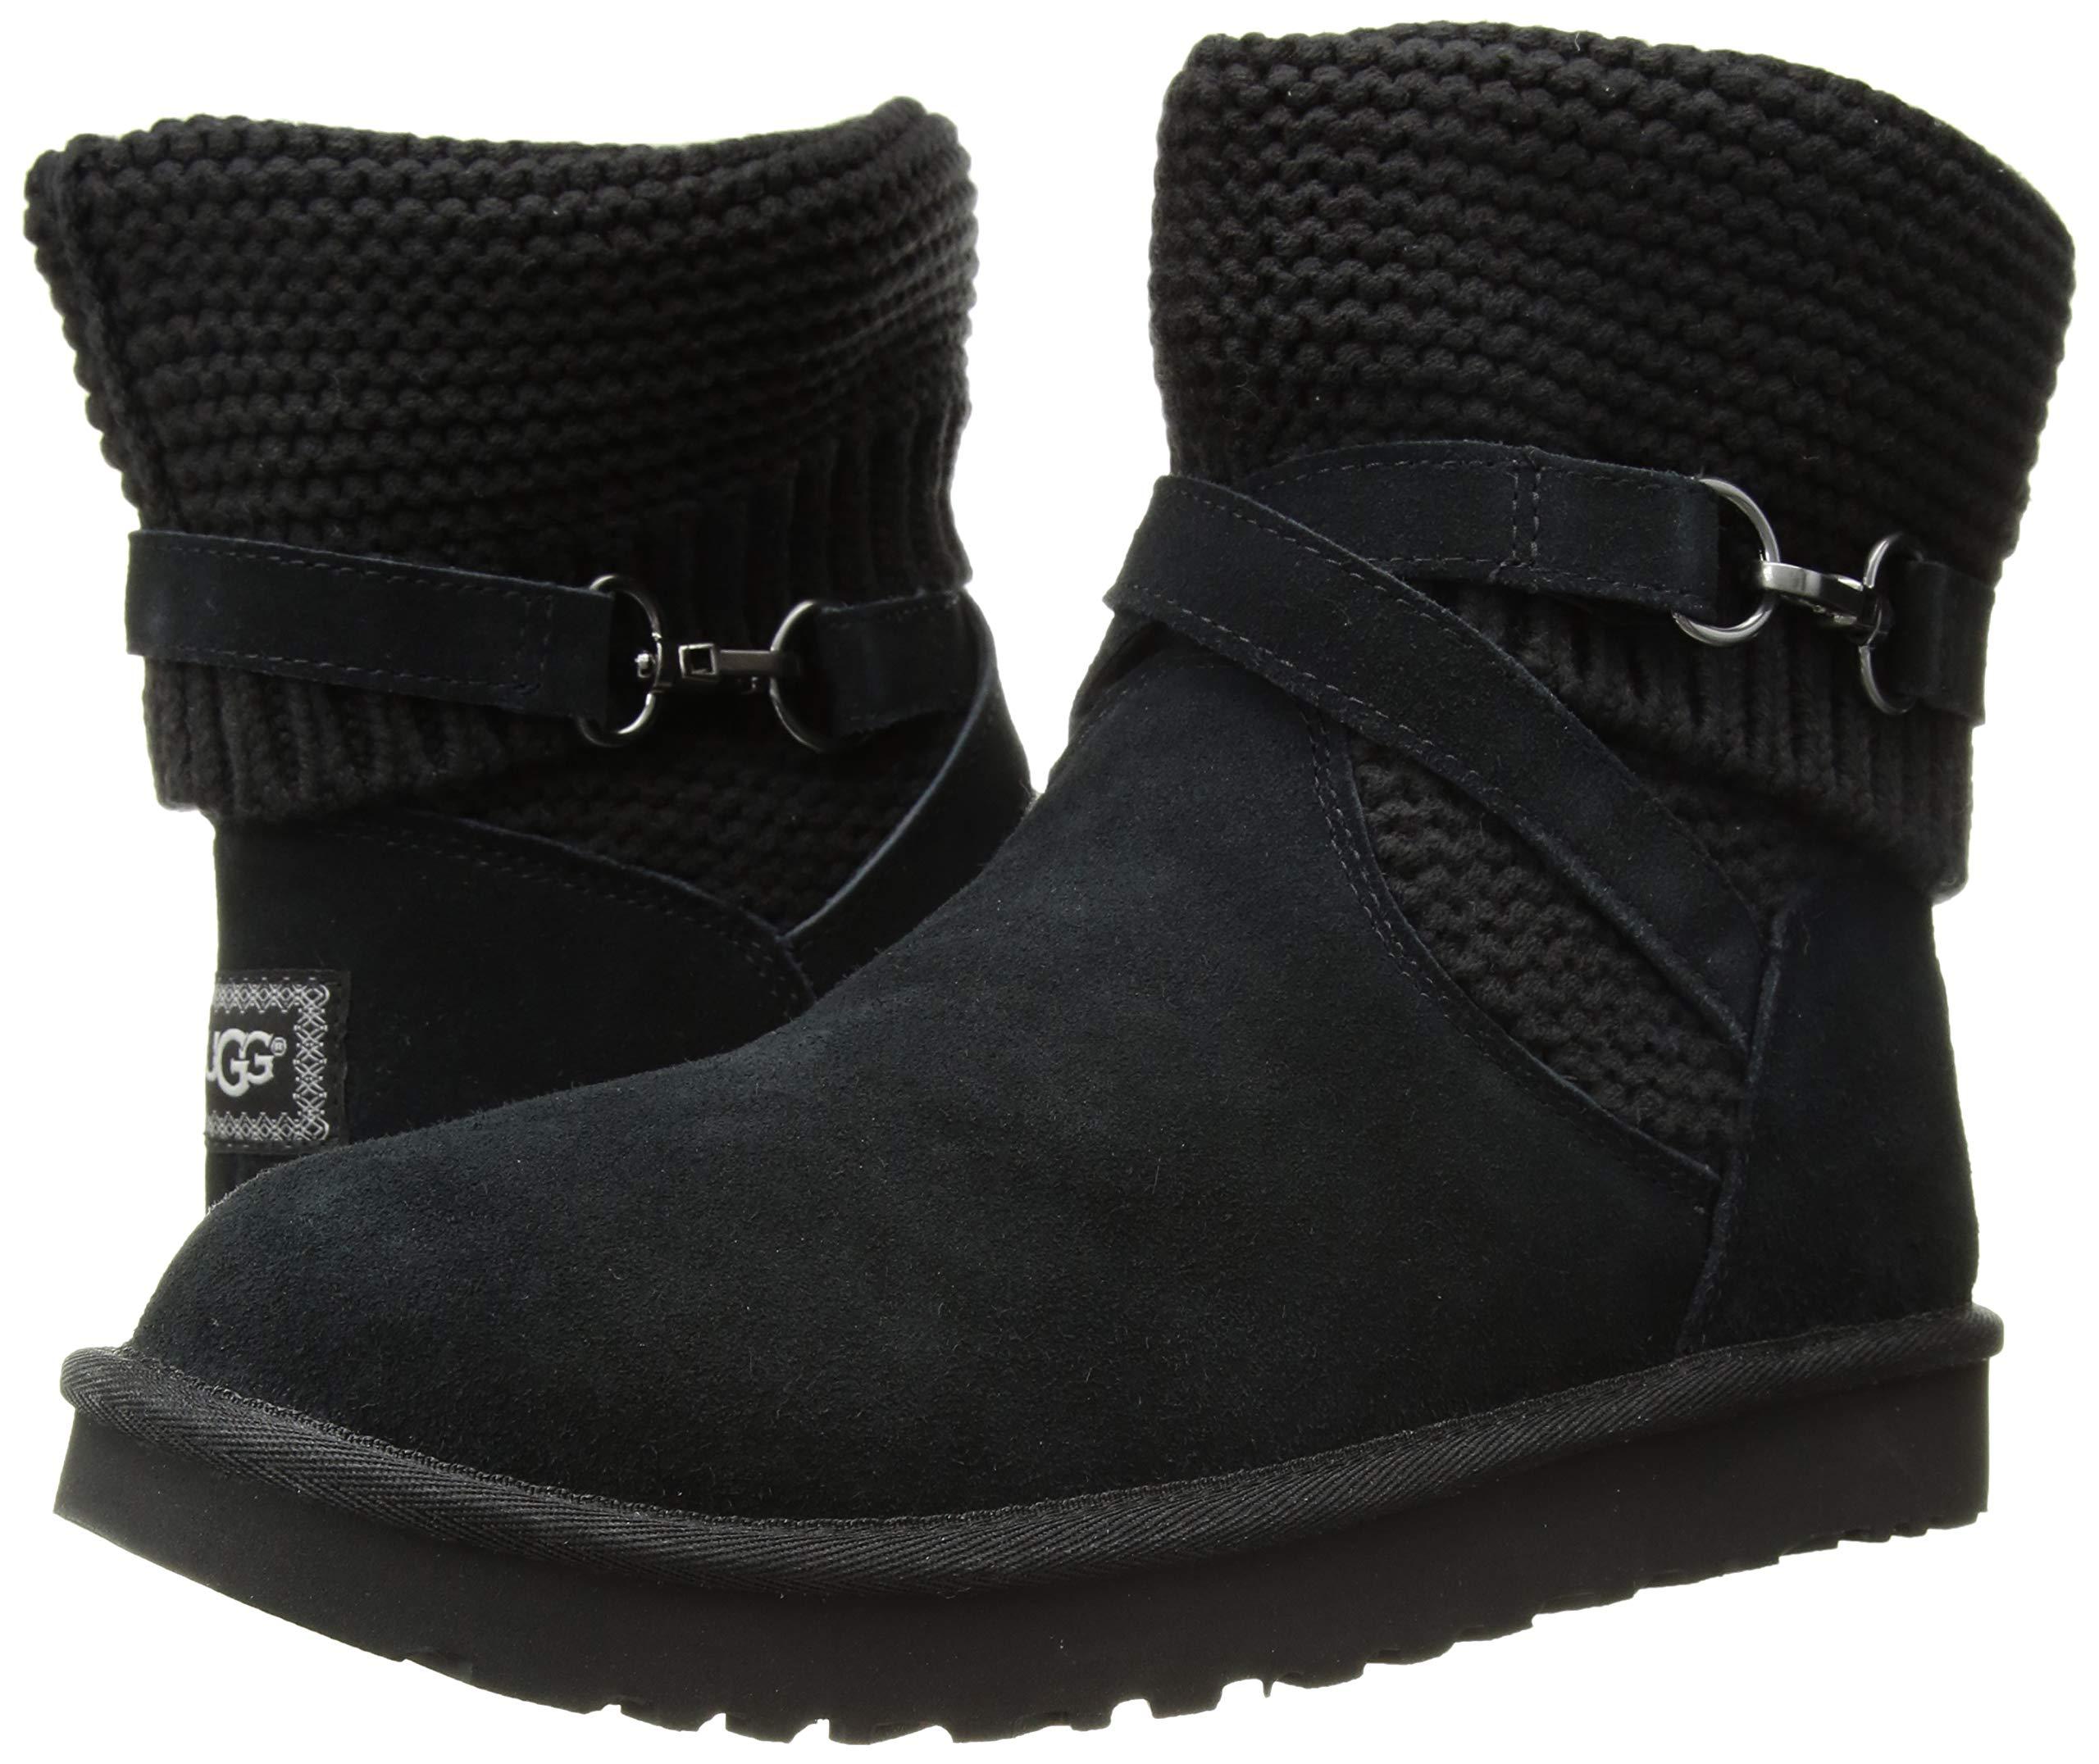 57a330cd0bf UGG Women's W PURL Strap Fashion Boot | A2Z Store